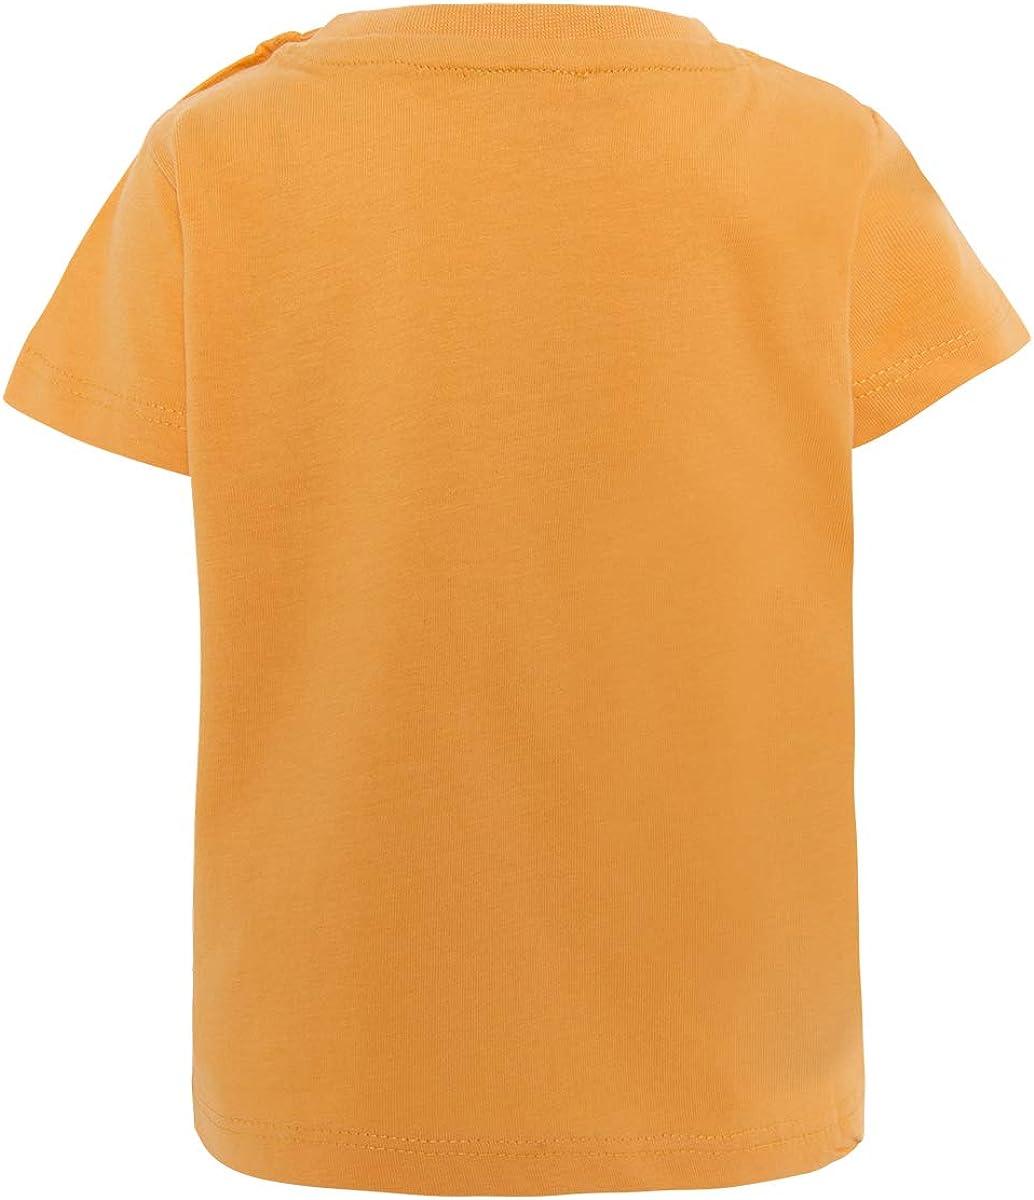 T-Shirt B/éb/é gar/çon Tuc Tuc Camiseta Punto Sencilla Ni/ño World Map T